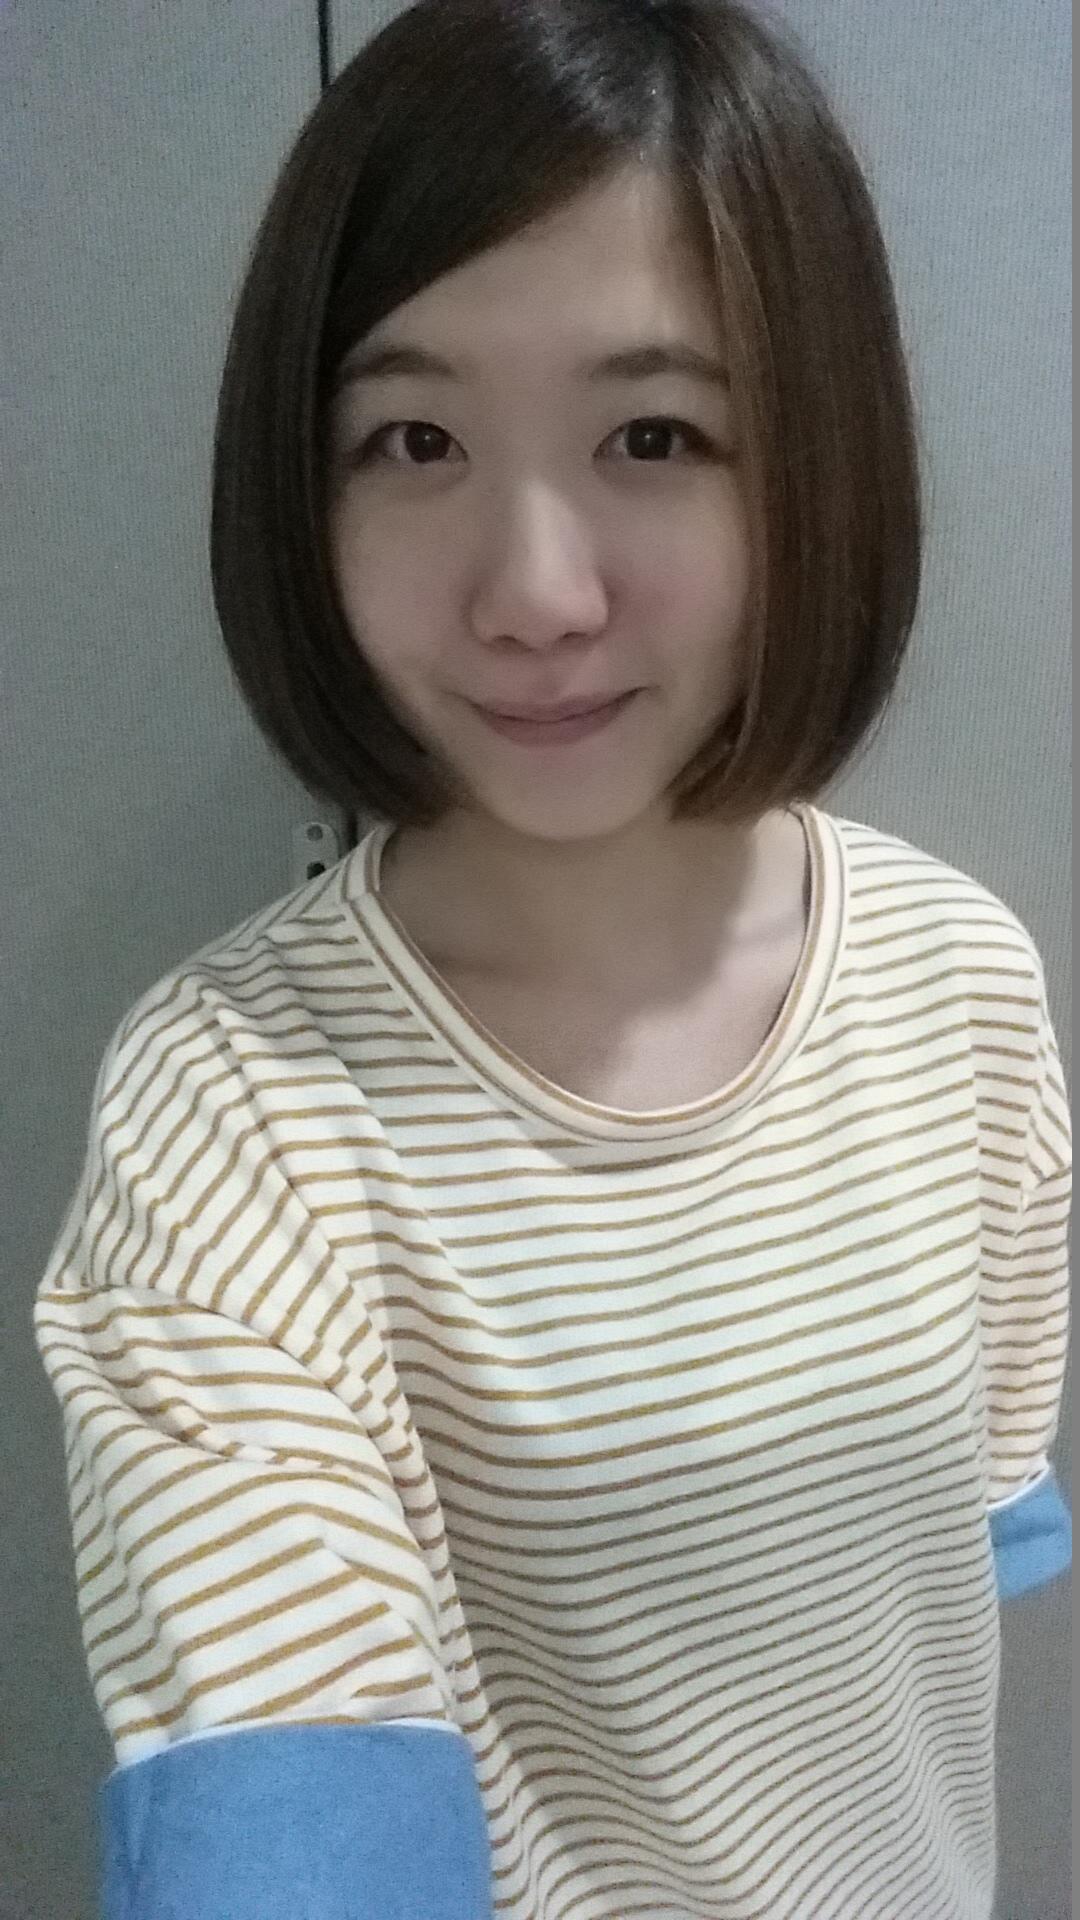 Joice Wang